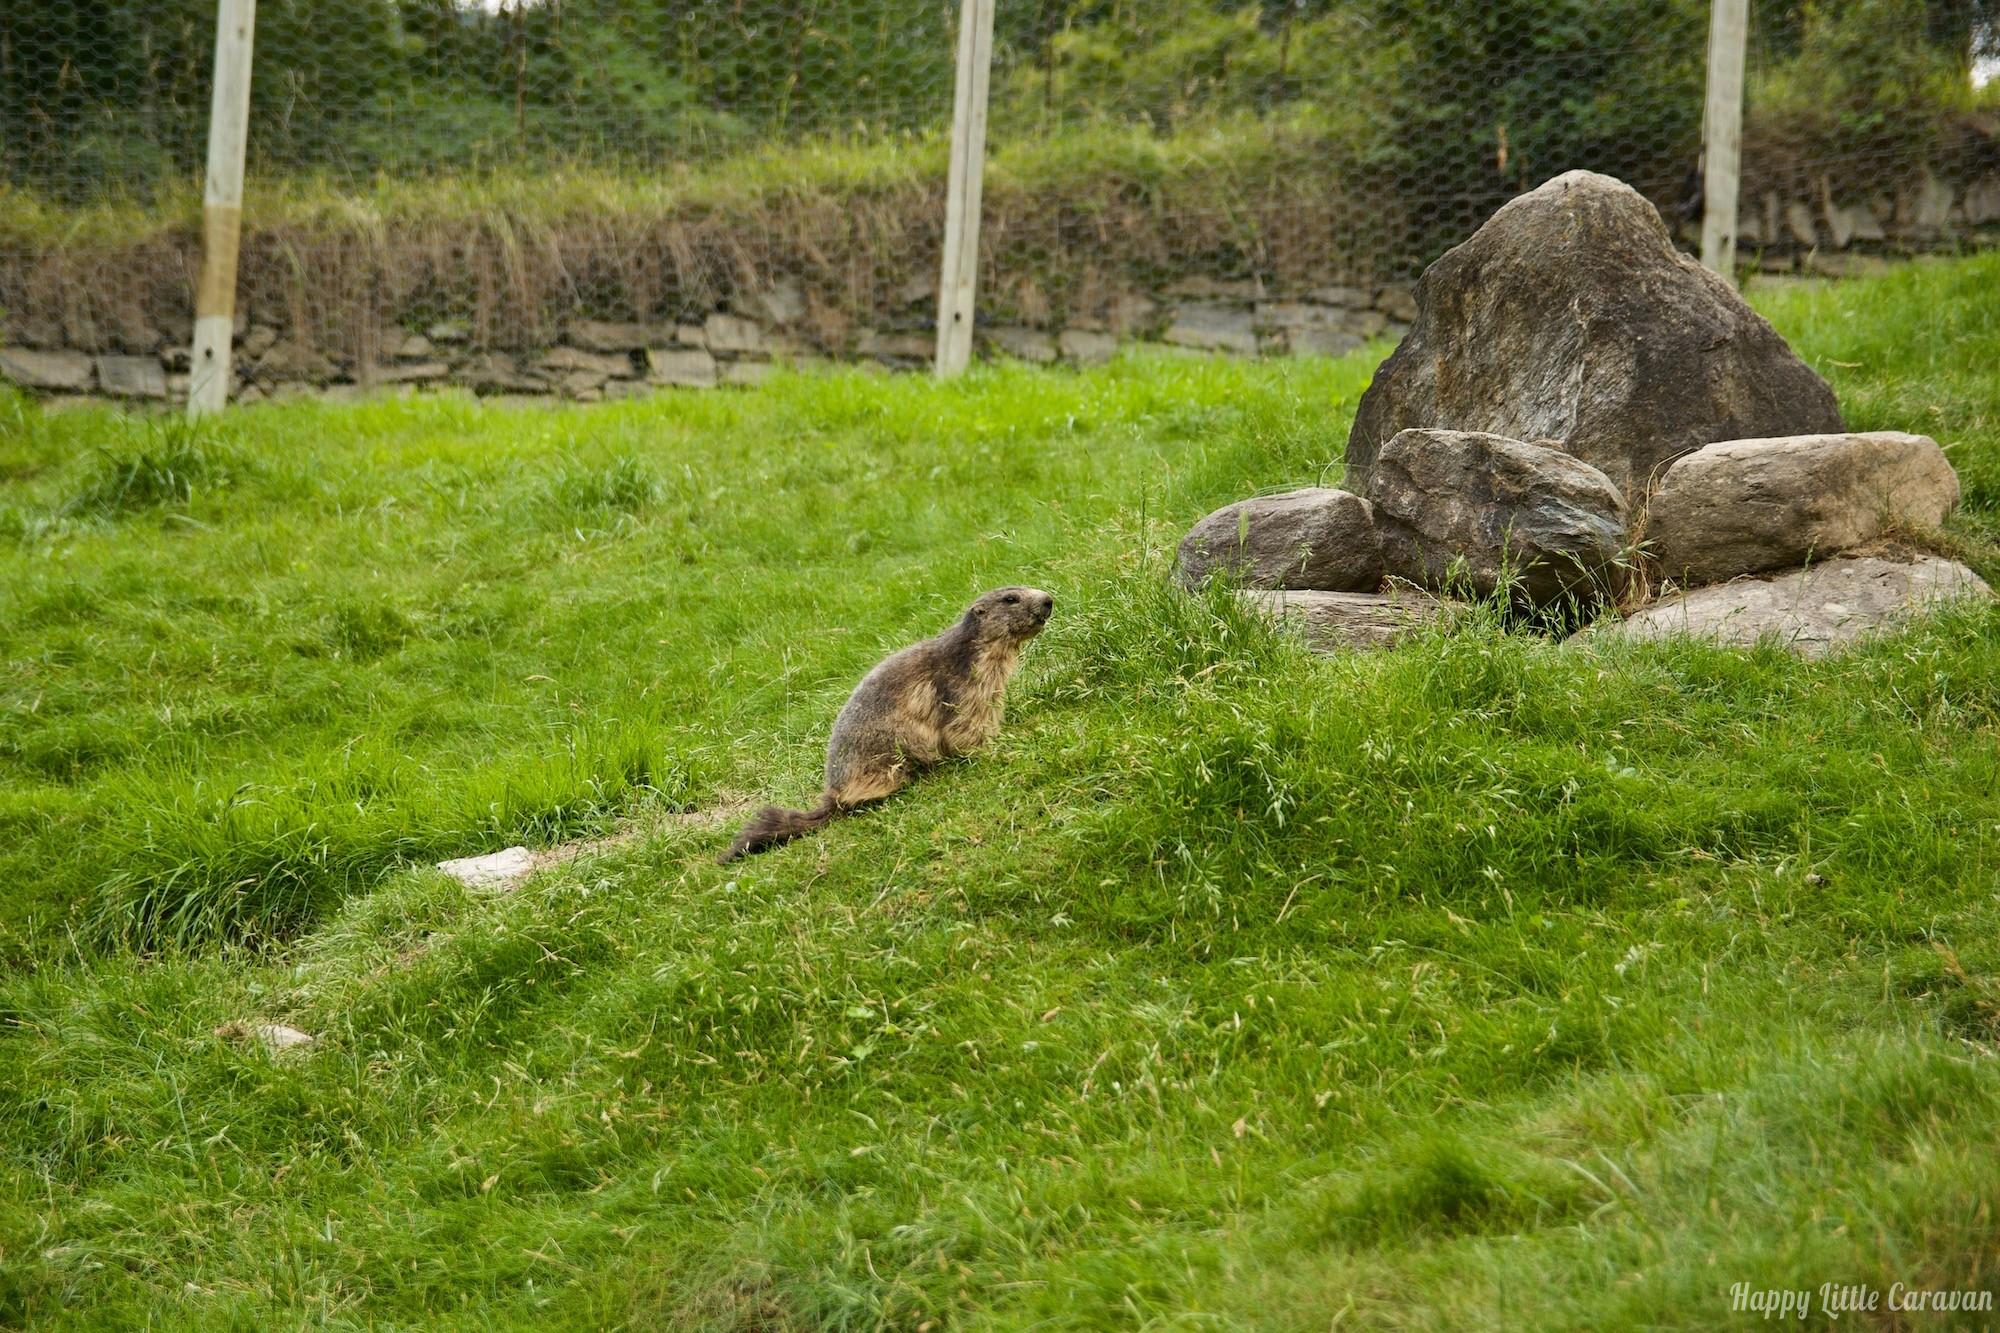 Parc Animalier d'Introd - zoo Valle d'Aosta - Marmotta